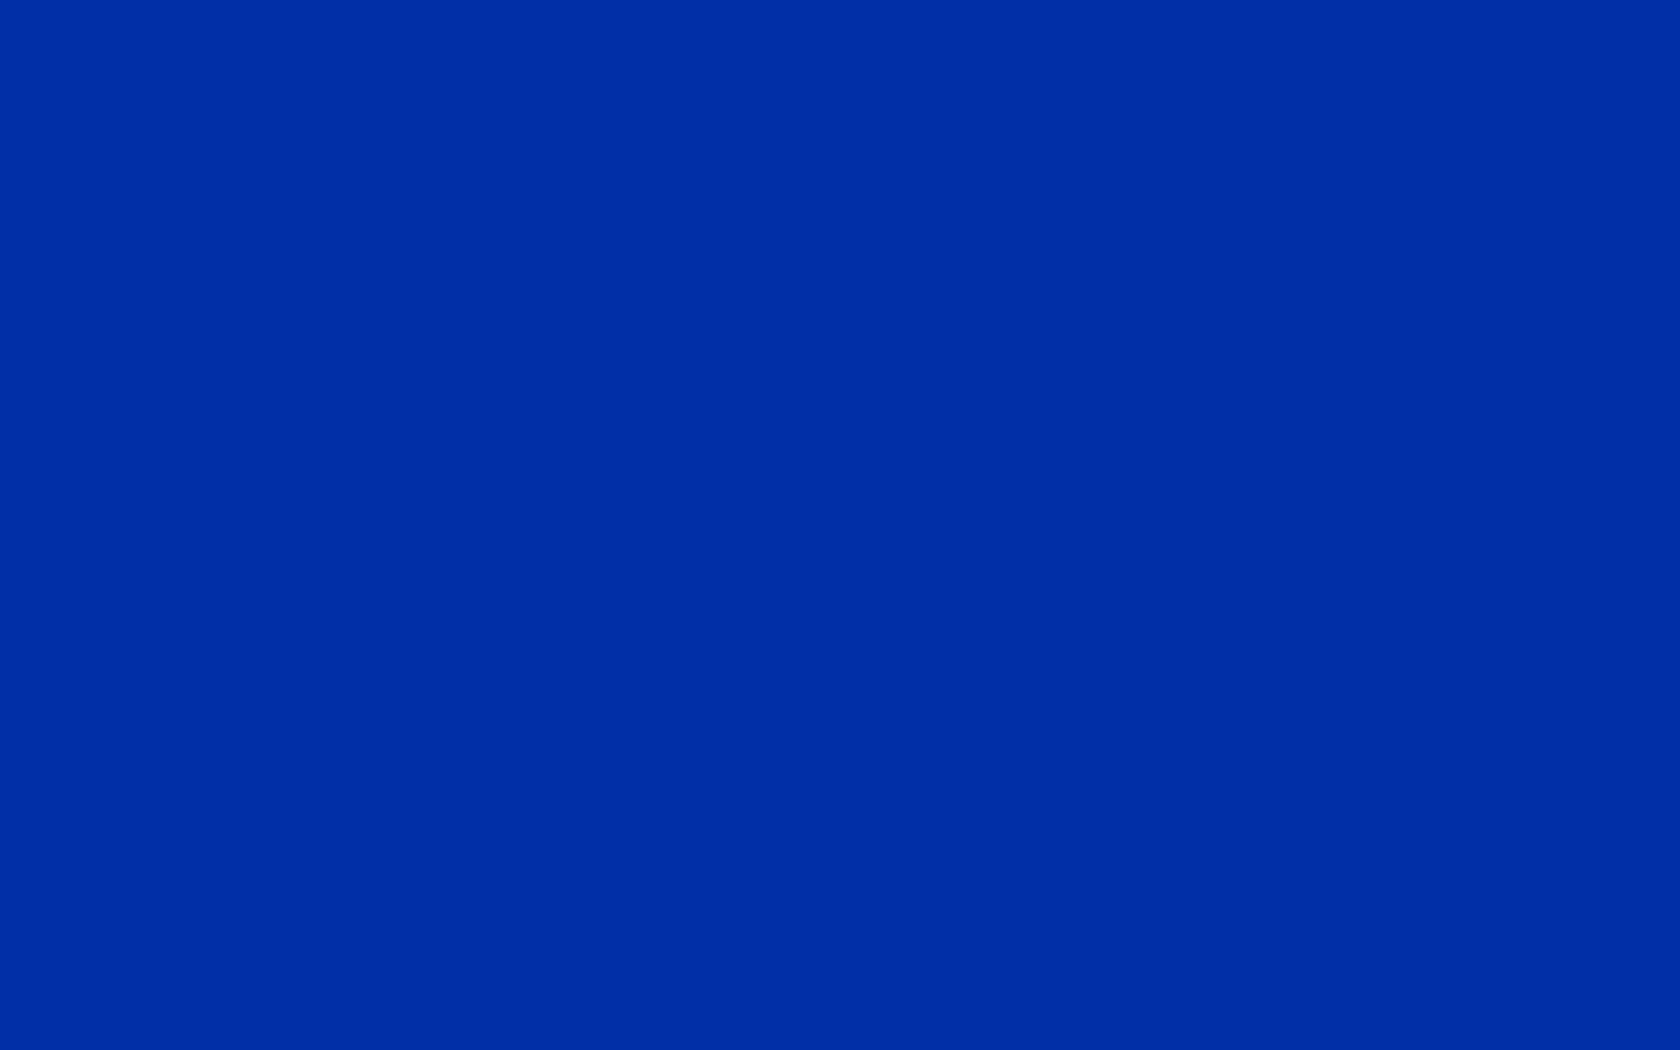 1680x1050 International Klein Blue Solid Color Background